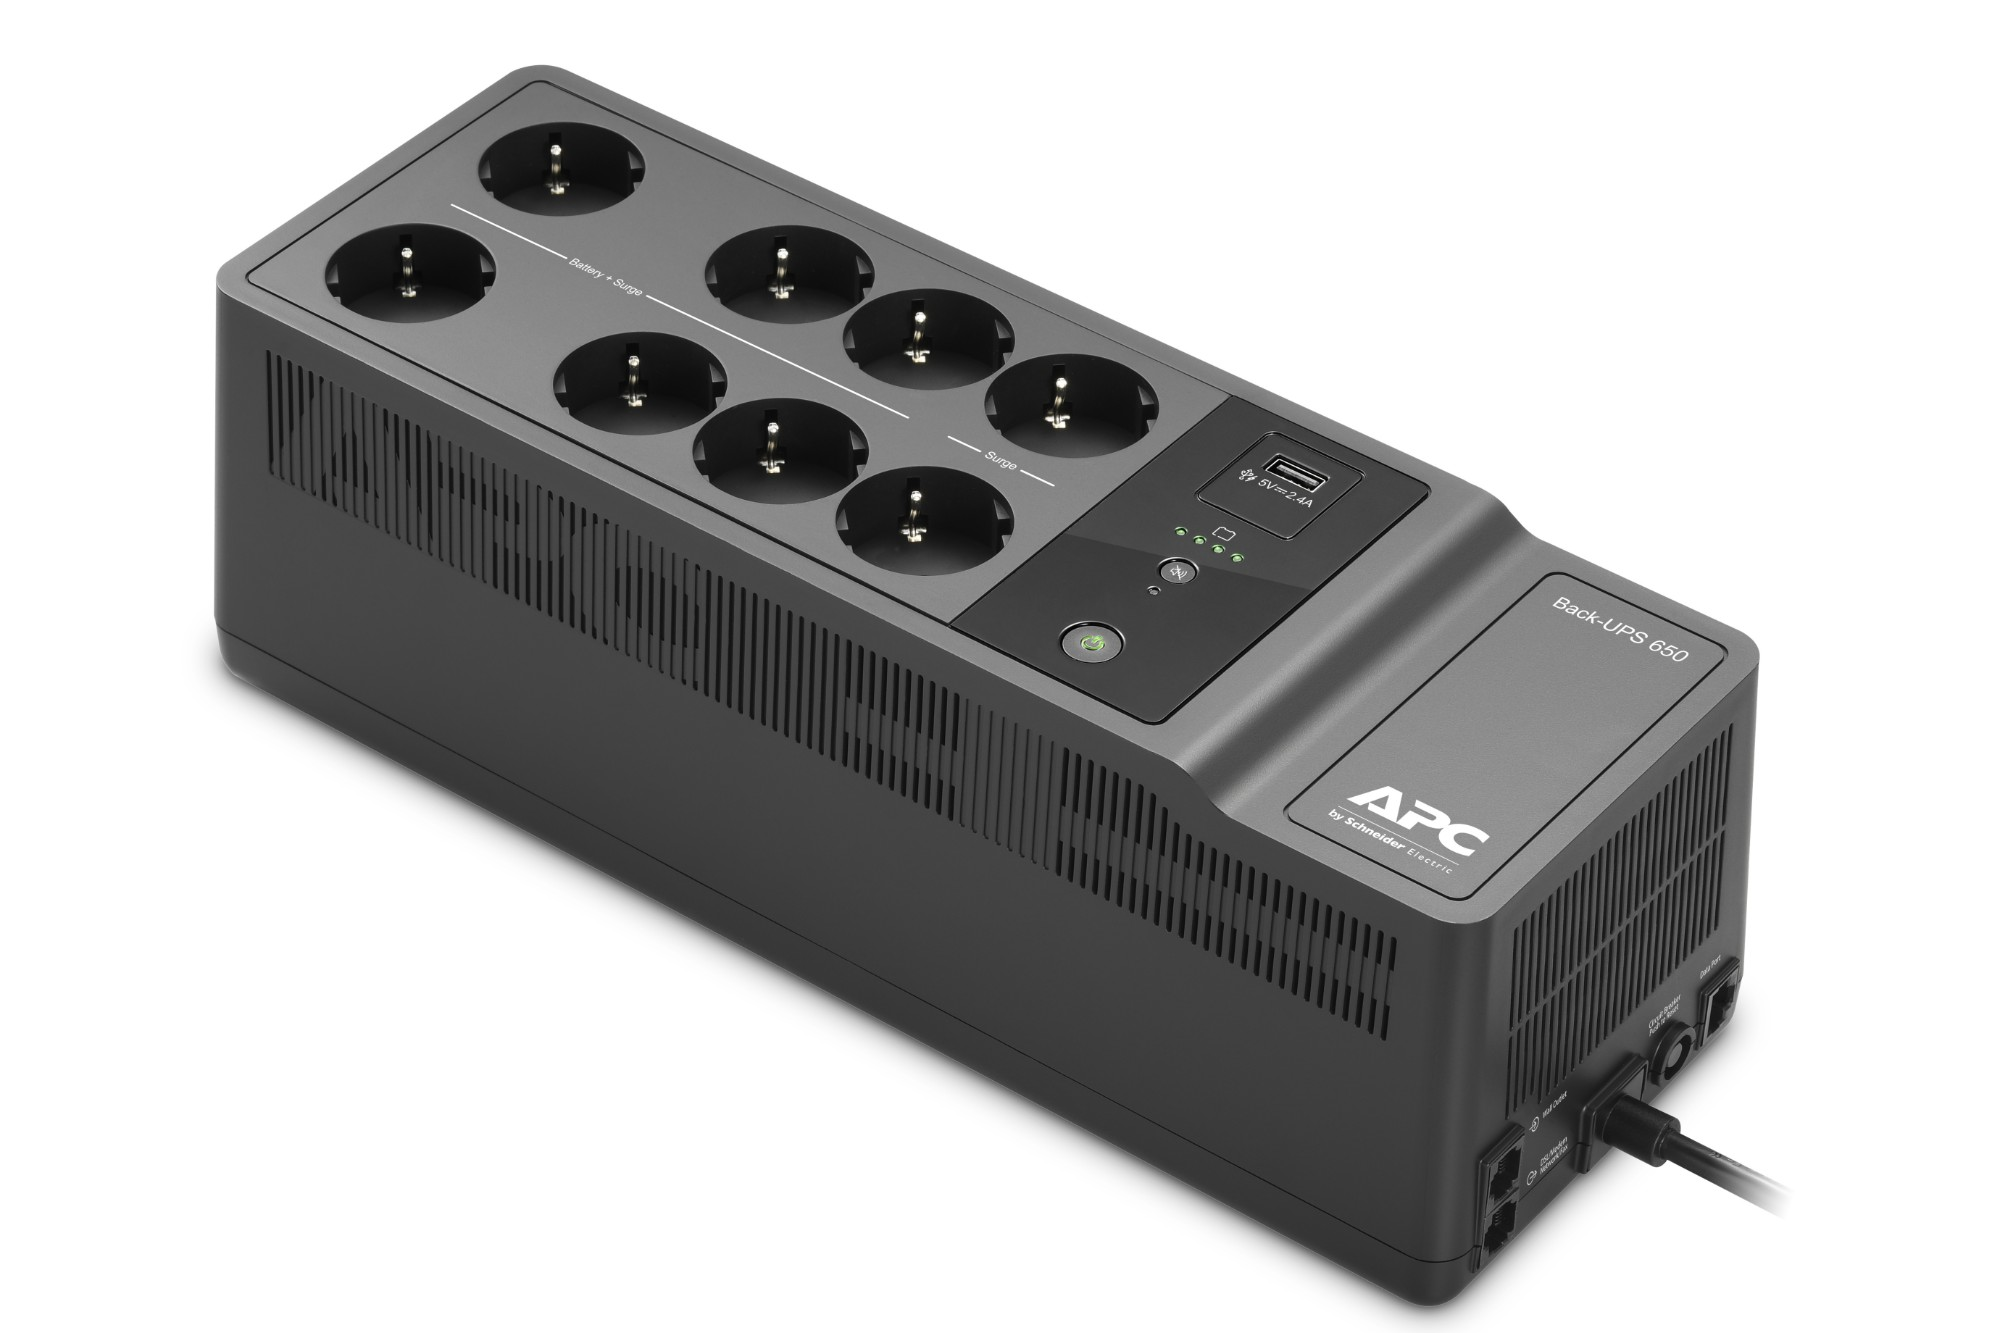 APC Back-UPS 650VA 230V 1 USB charging port - (Offline-) USV Standby (Offline) 0.65 kVA 400 W 8 AC outlet(s)